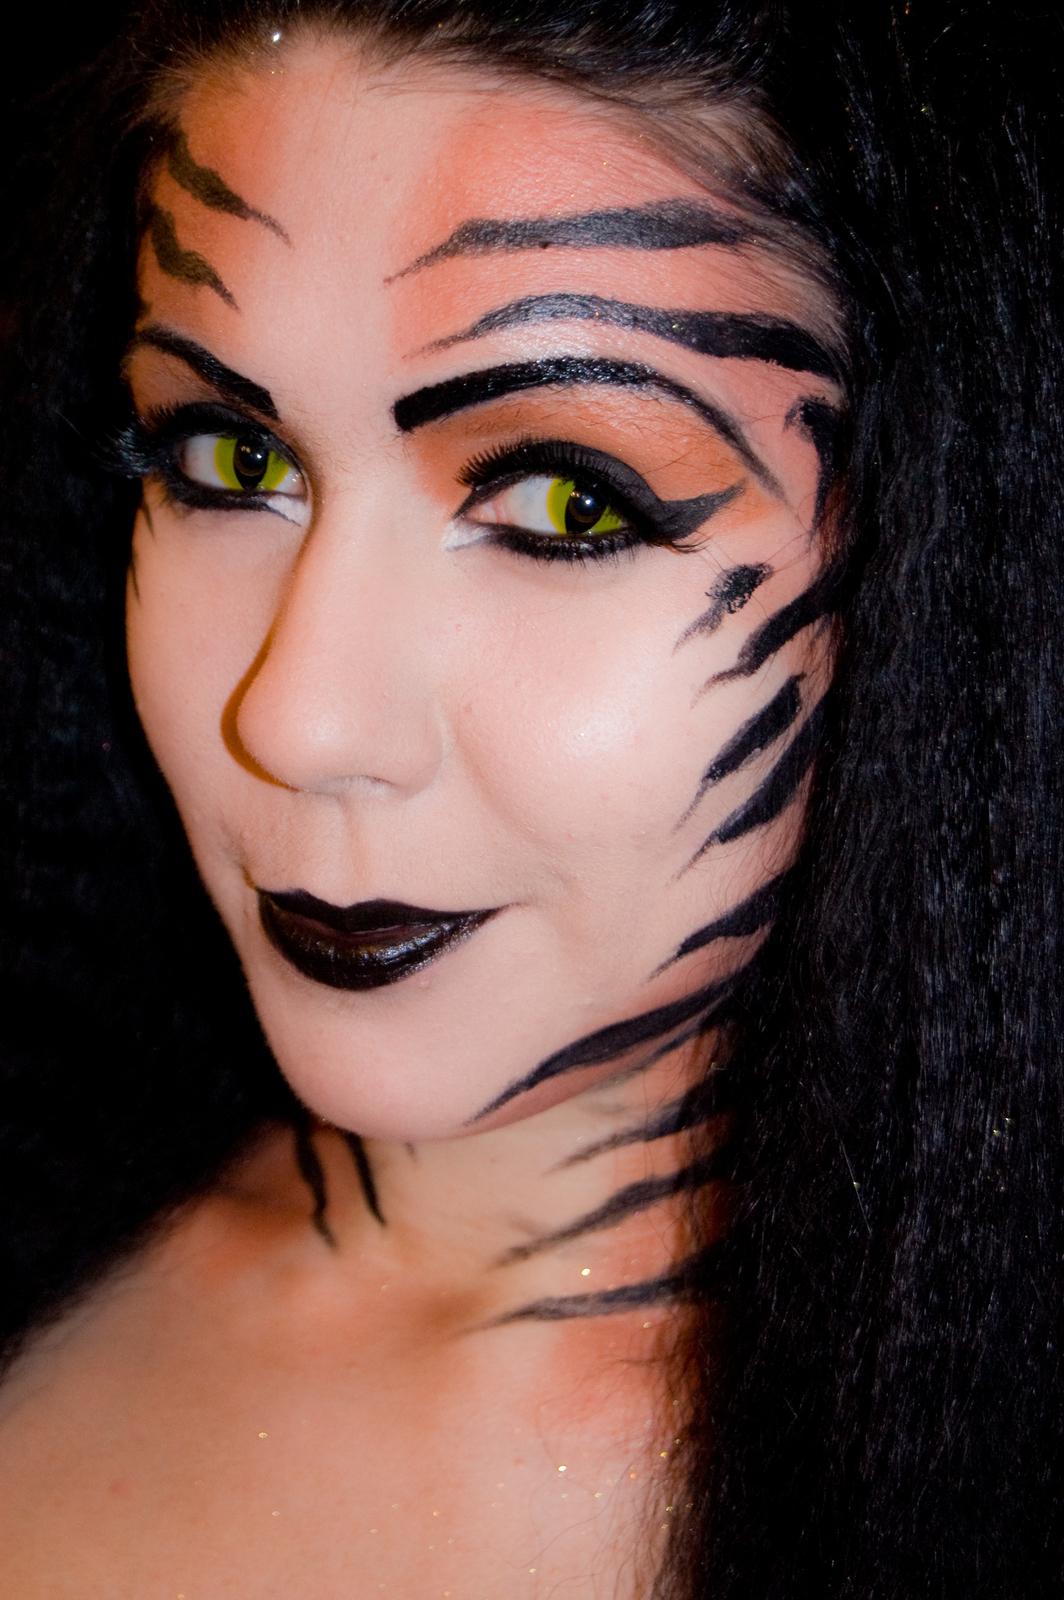 Tiger Goddess Makeup · A Face Painting · MakeUp Techniques